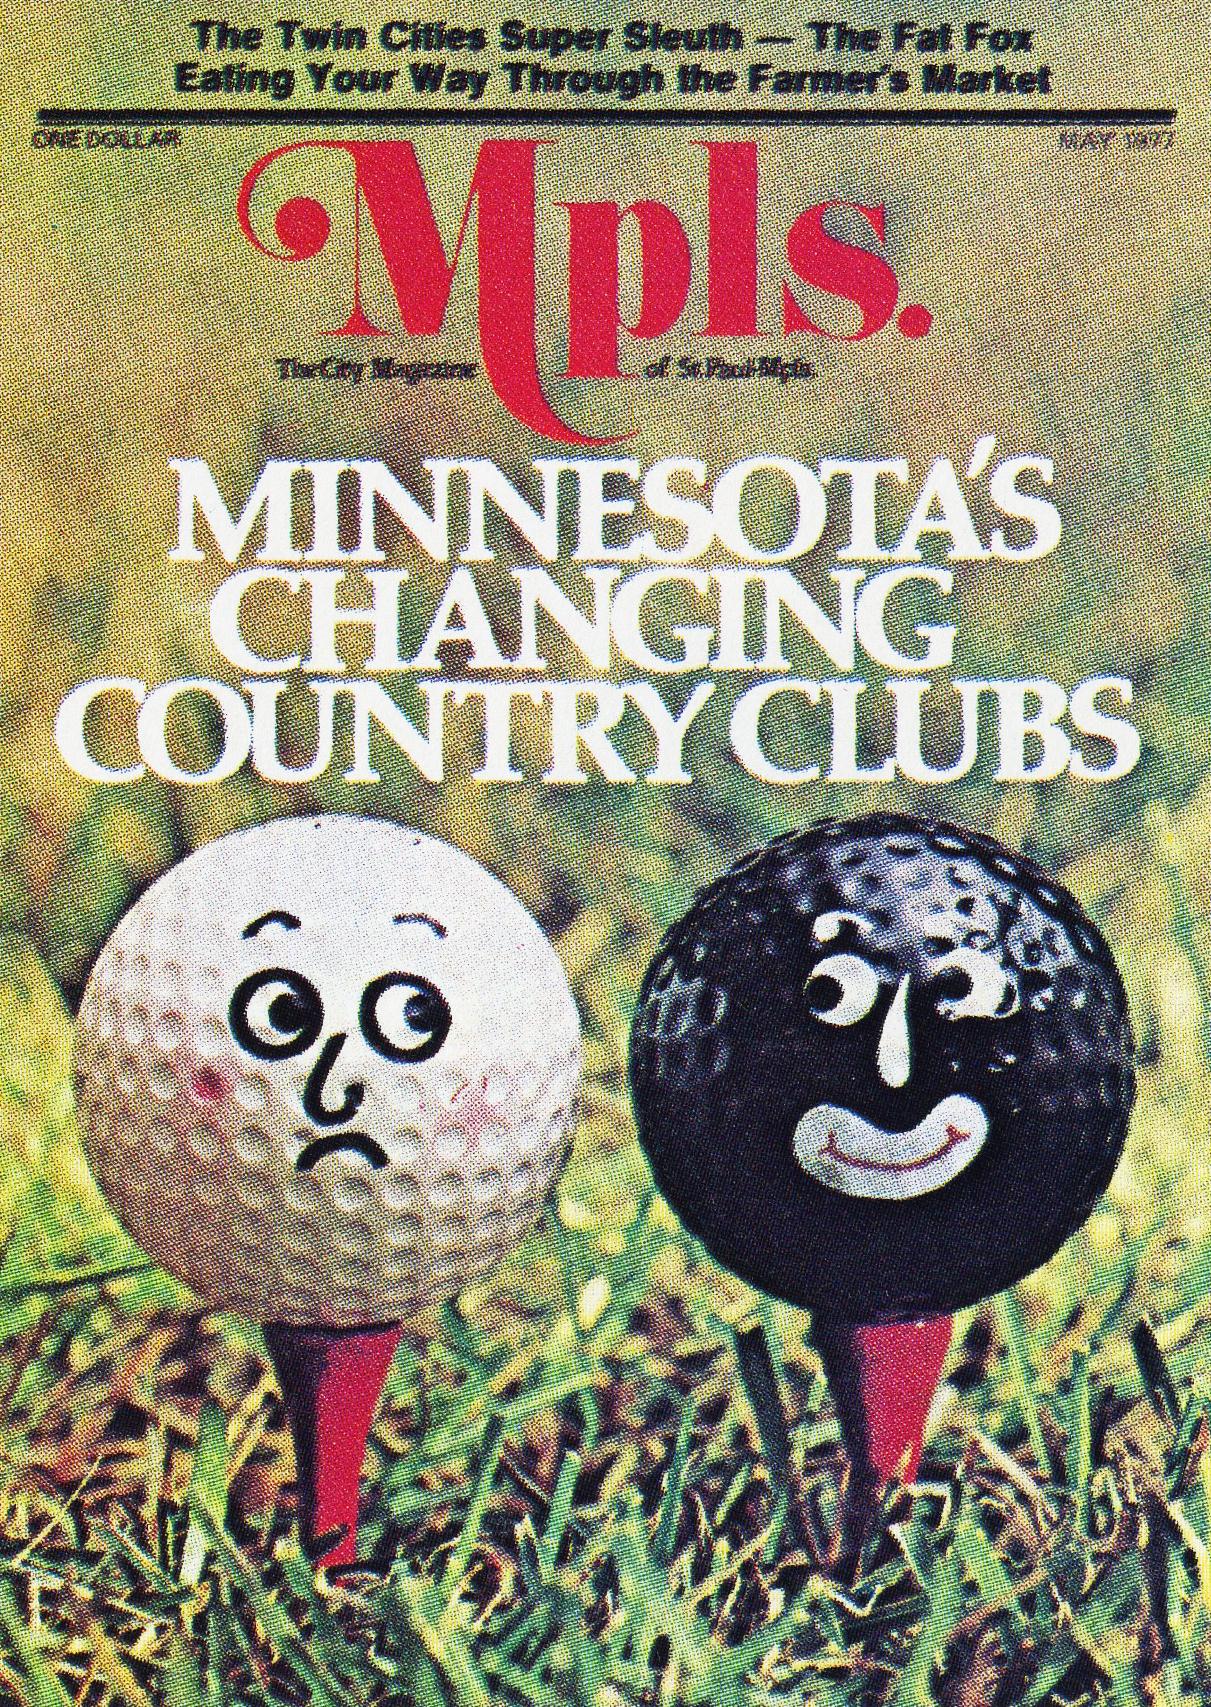 golf-cover-mpls-magazine-tom-mcelligott-bozell-01